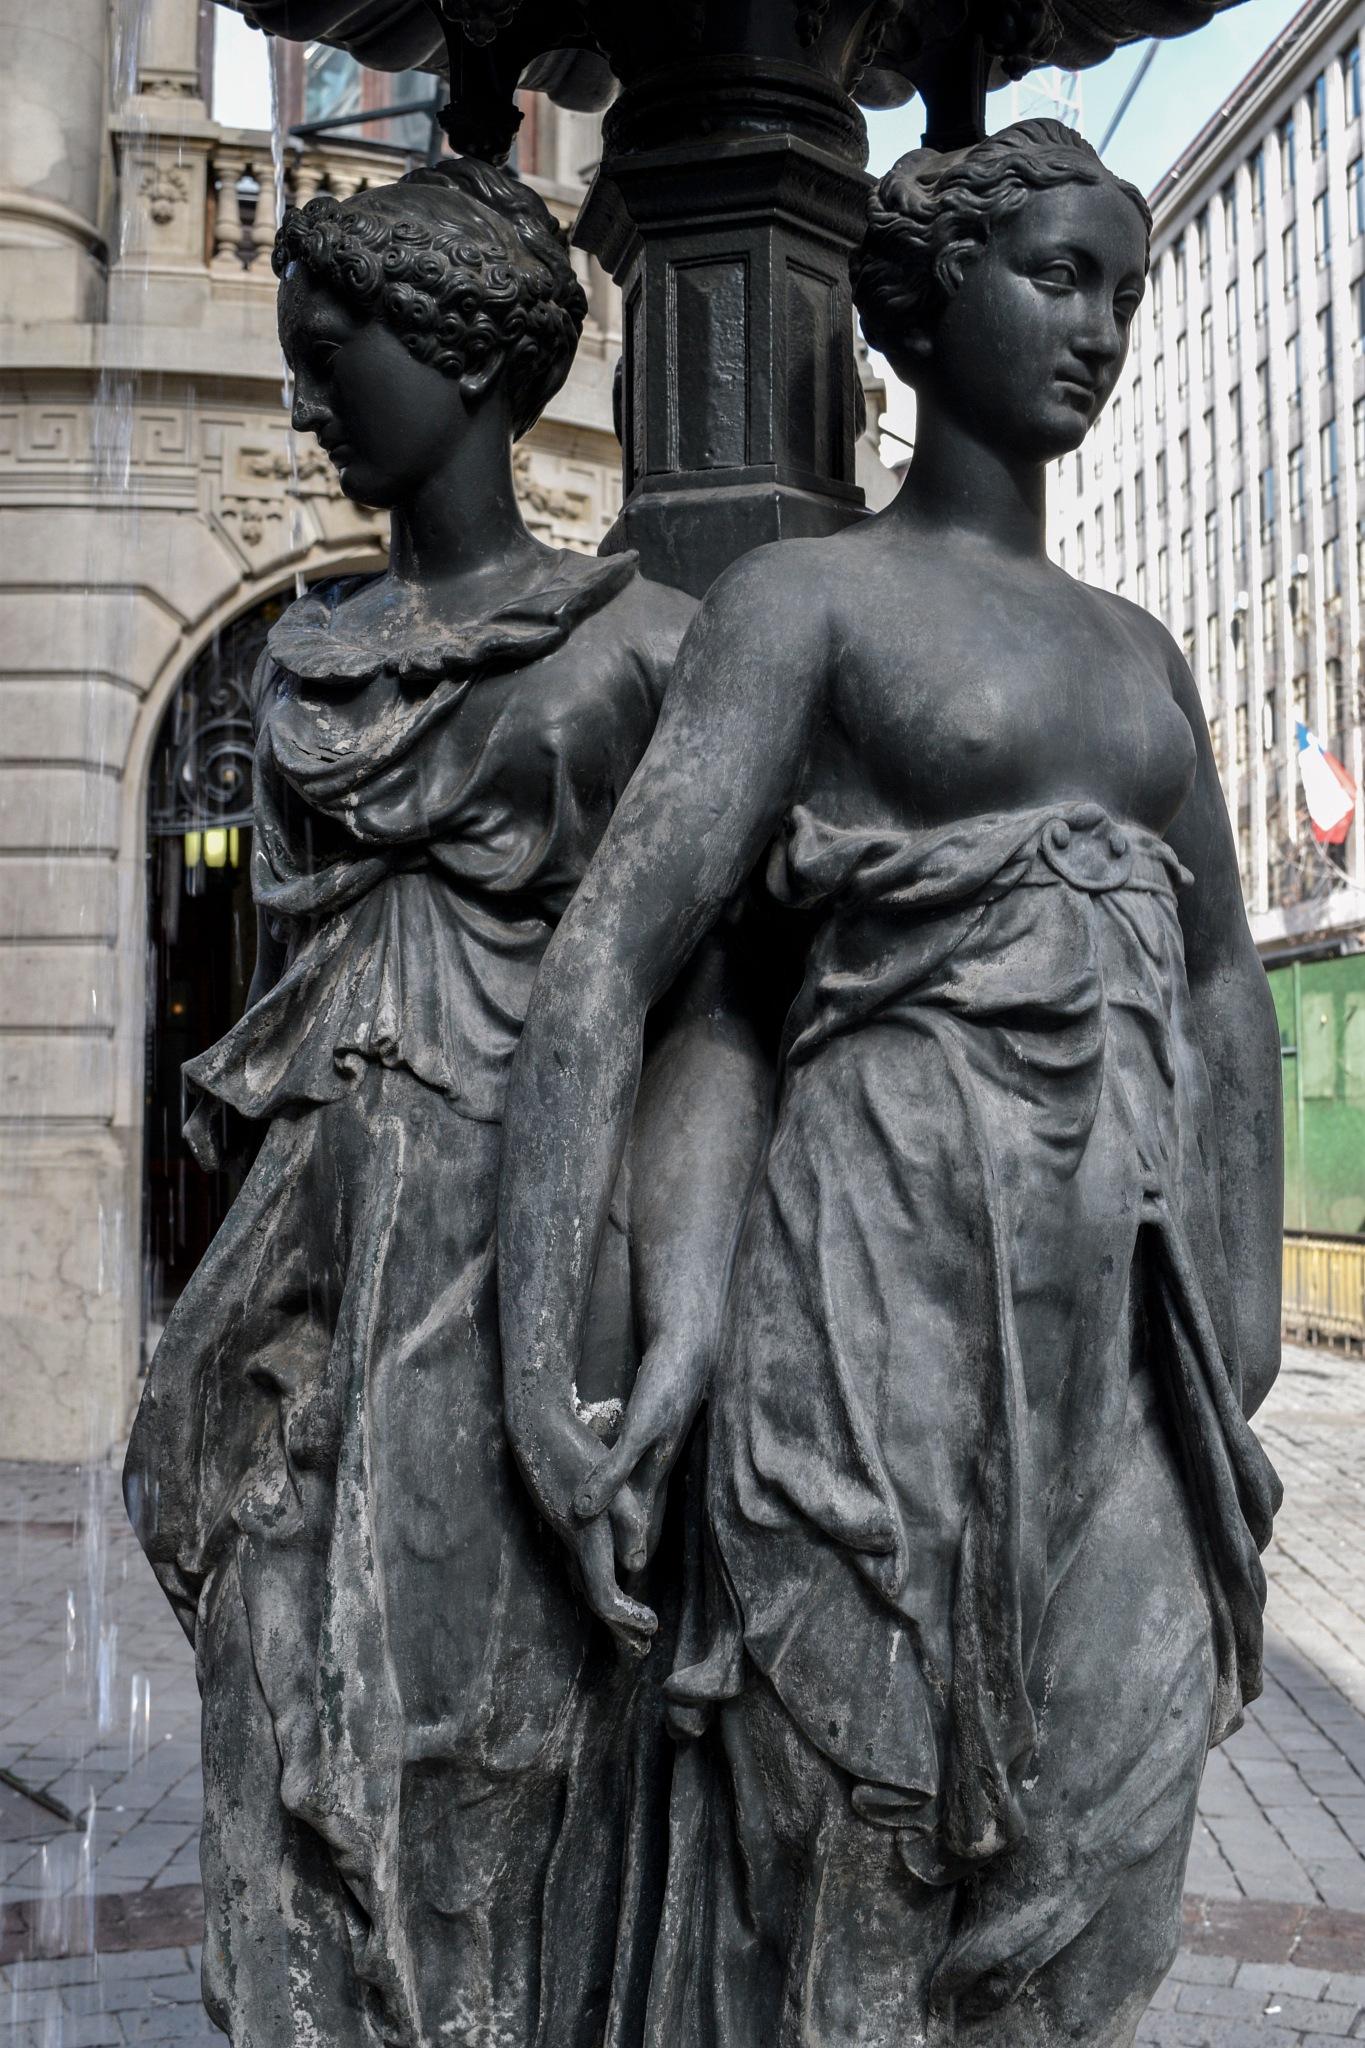 Esculture in New York avenue. by Phsepulveda